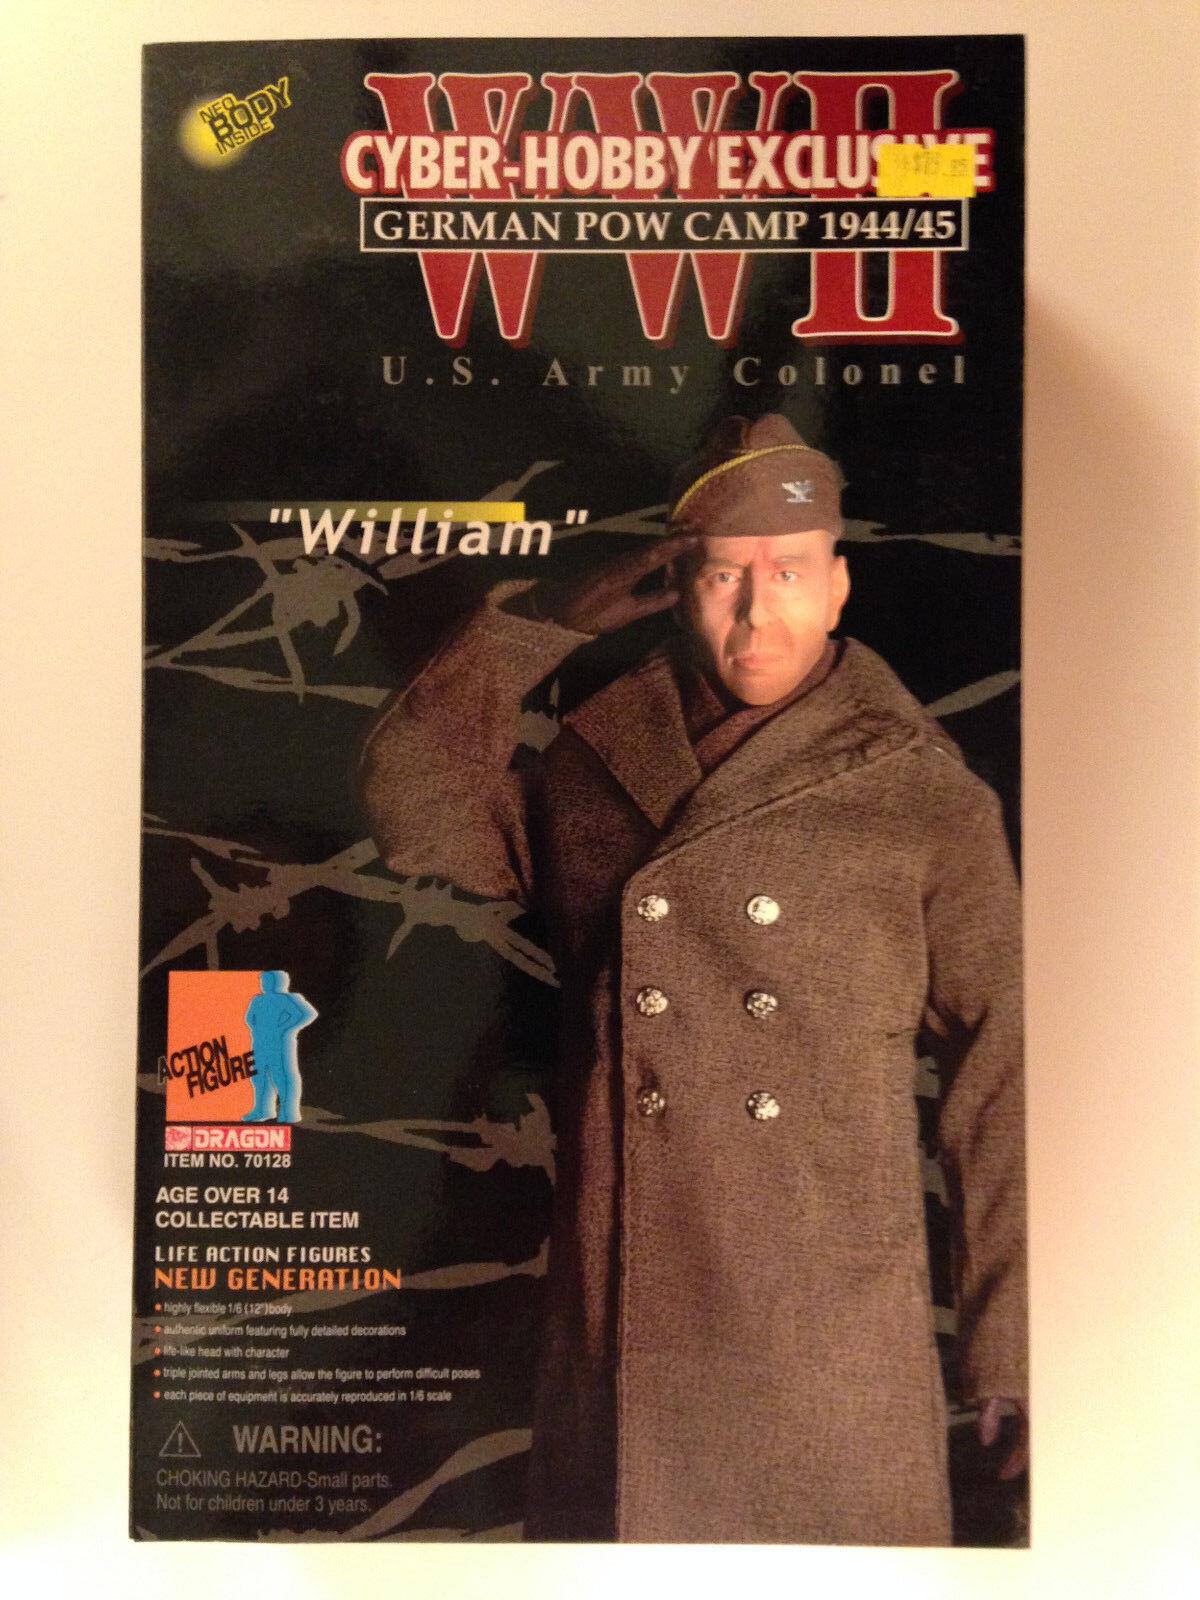 Dragon De 12 Pulgadas Segunda Guerra Mundial 1944 Cyber-hobby Bruce Willis Hart's War Coronel William Figura